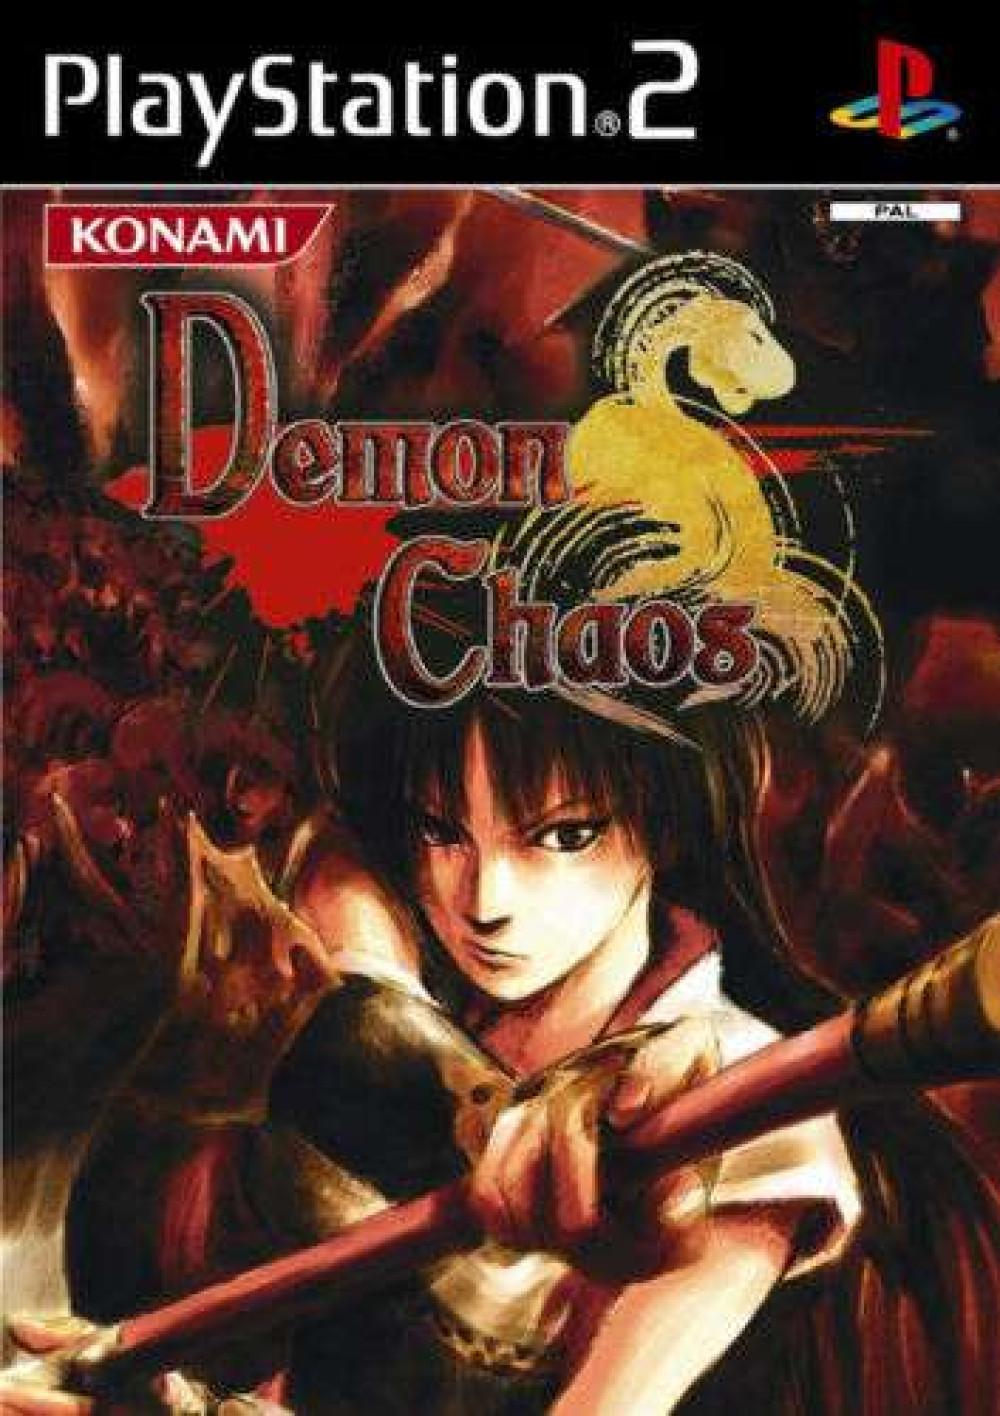 PS2 Demon Chaos